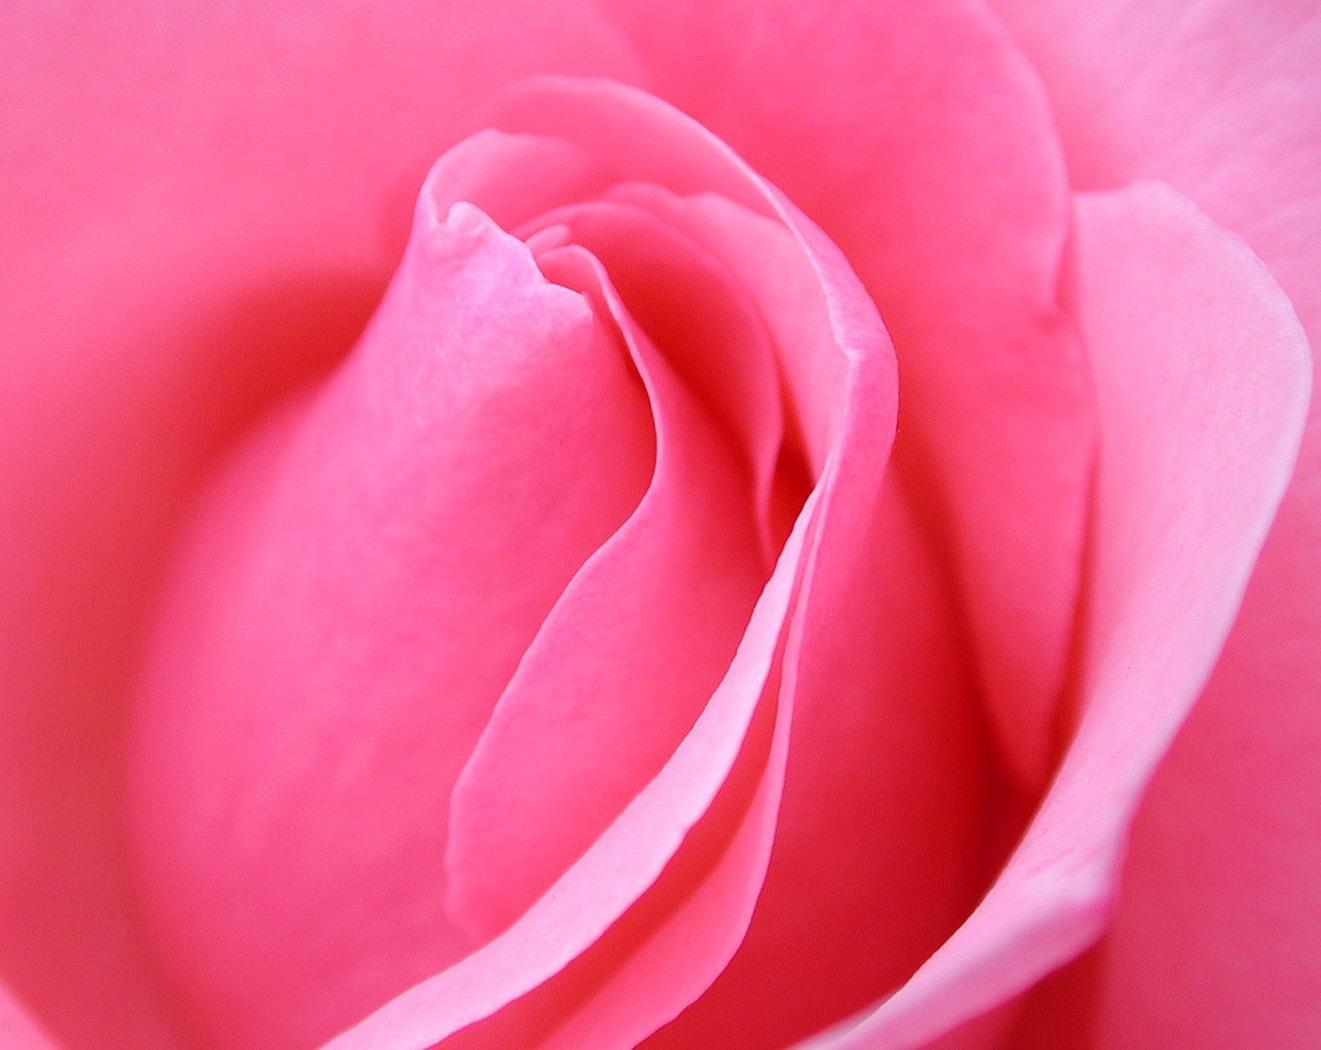 Pink Flowers Meaning 9 Hd Wallpaper Lovelight Meditation Circle